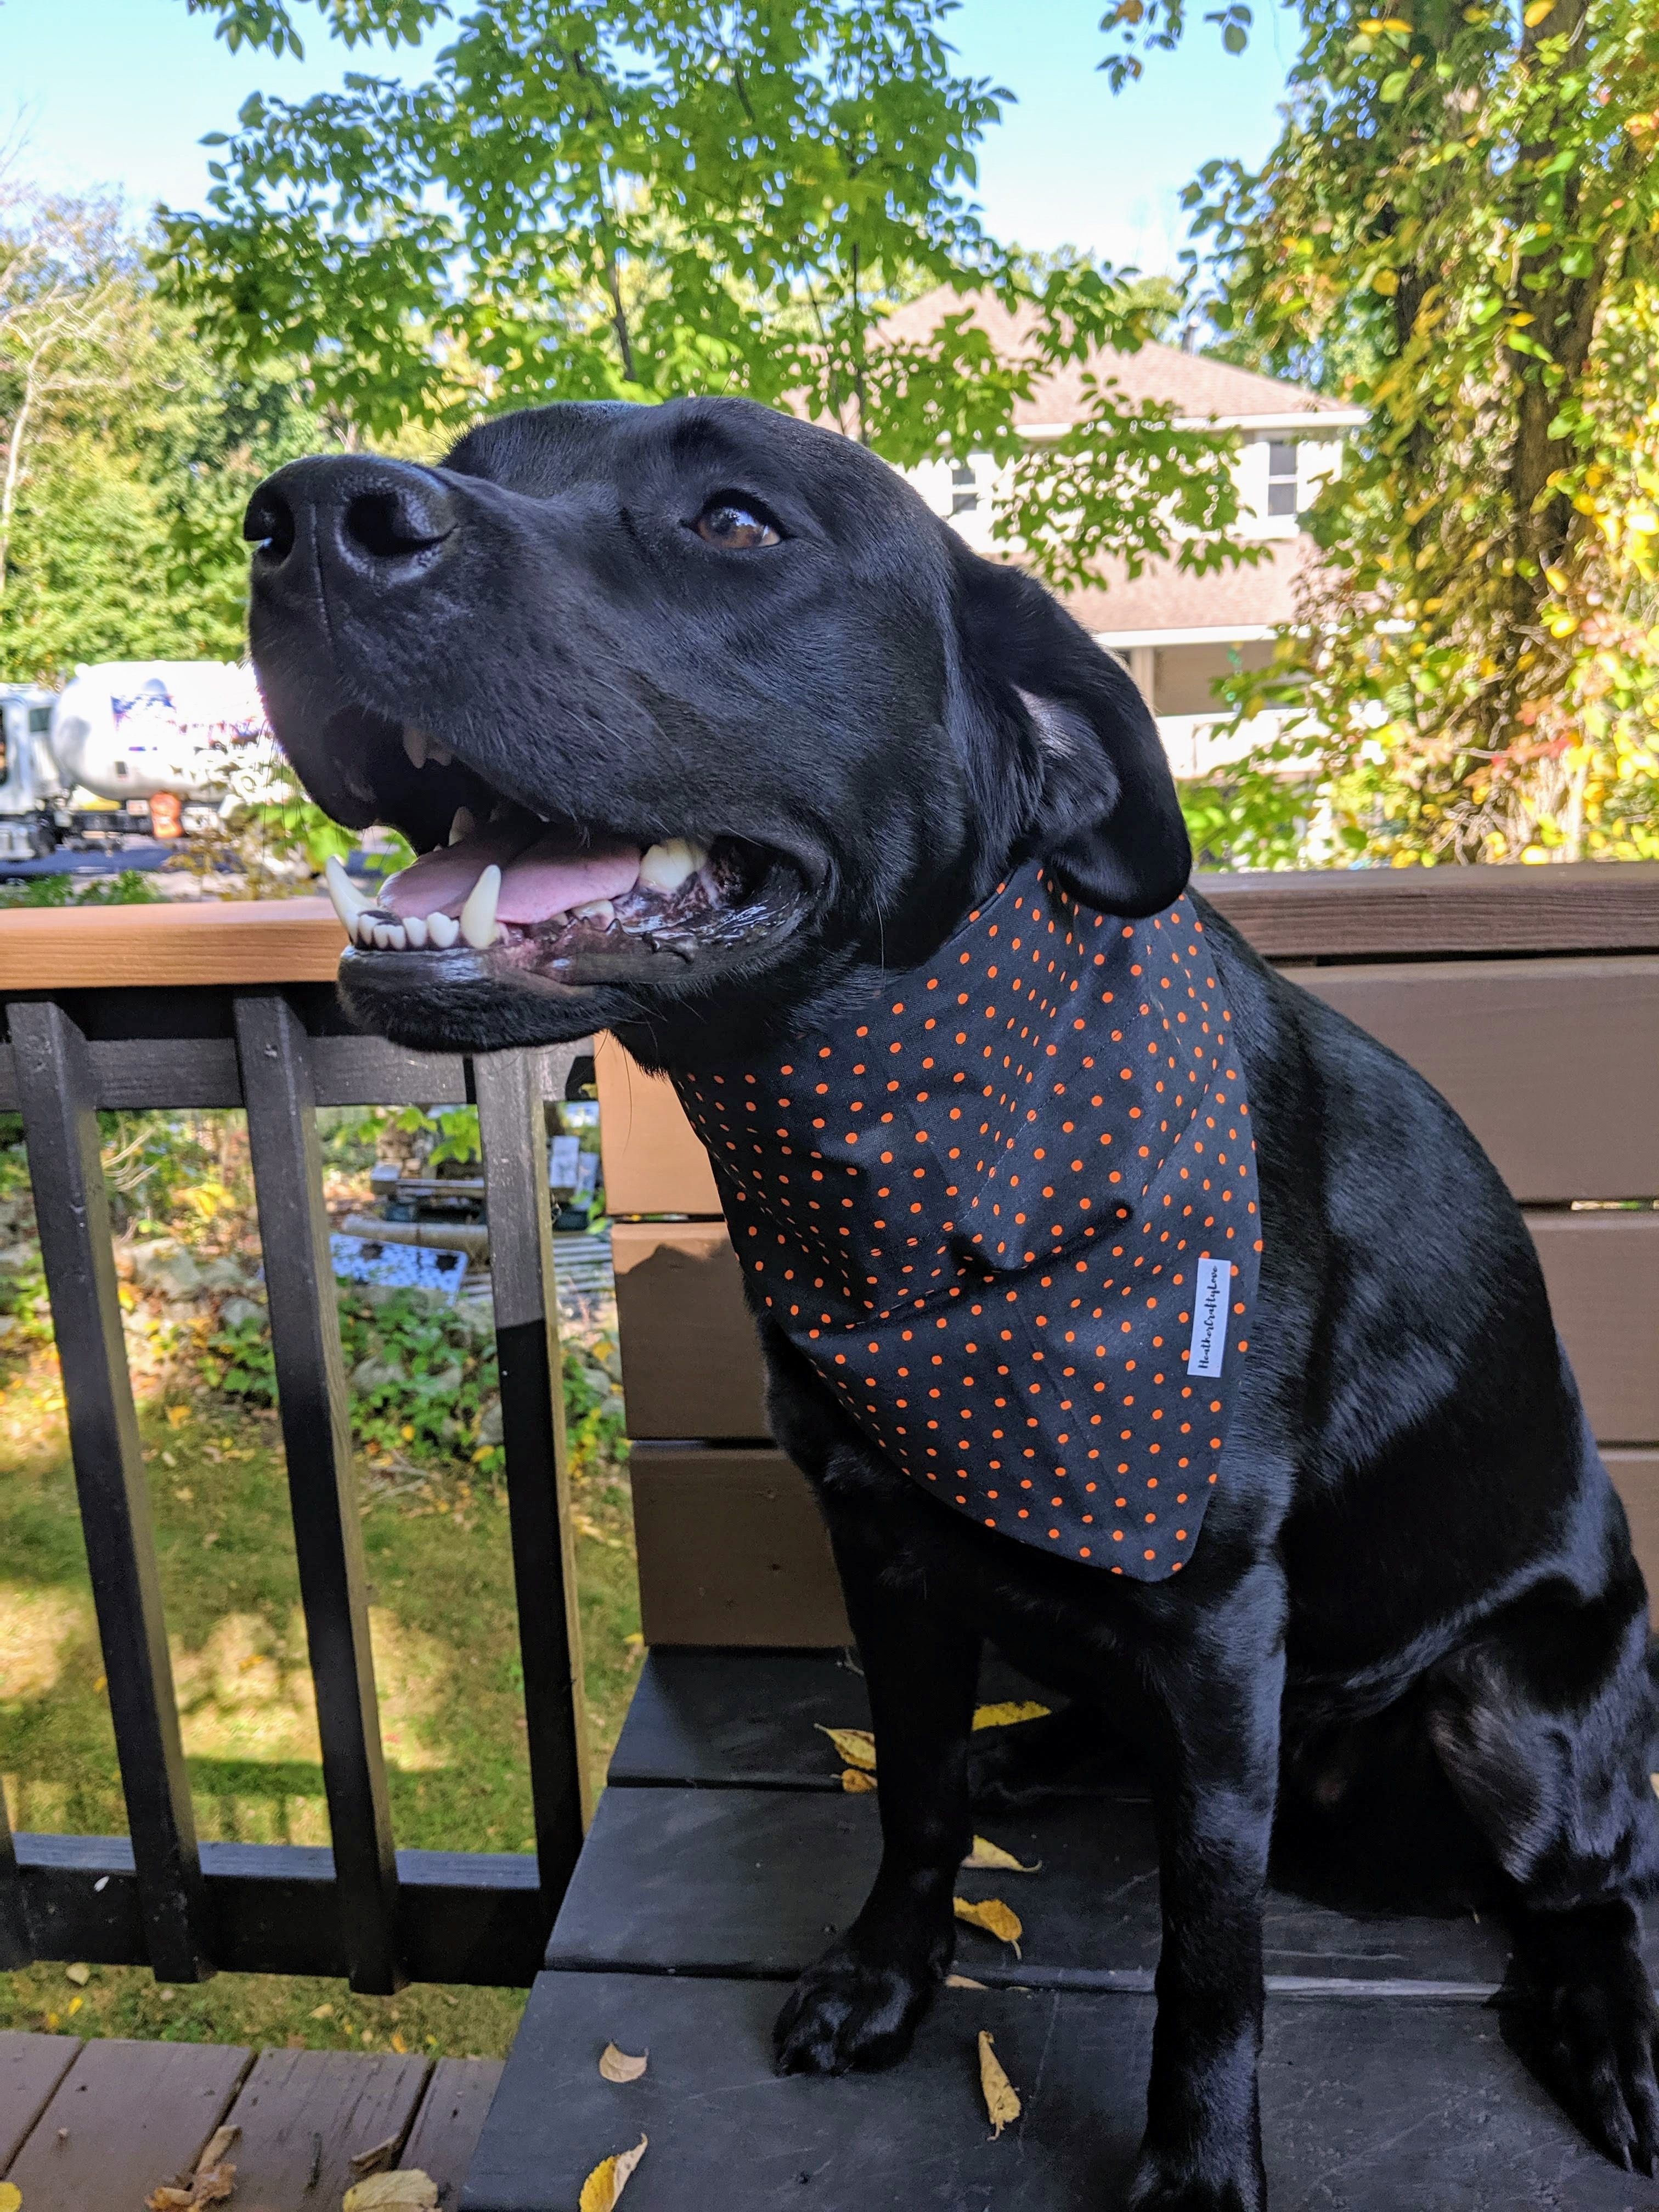 Polka Dot Bandana In 2020 Black Labrador Retriever Labrador Retriever Black Labrador